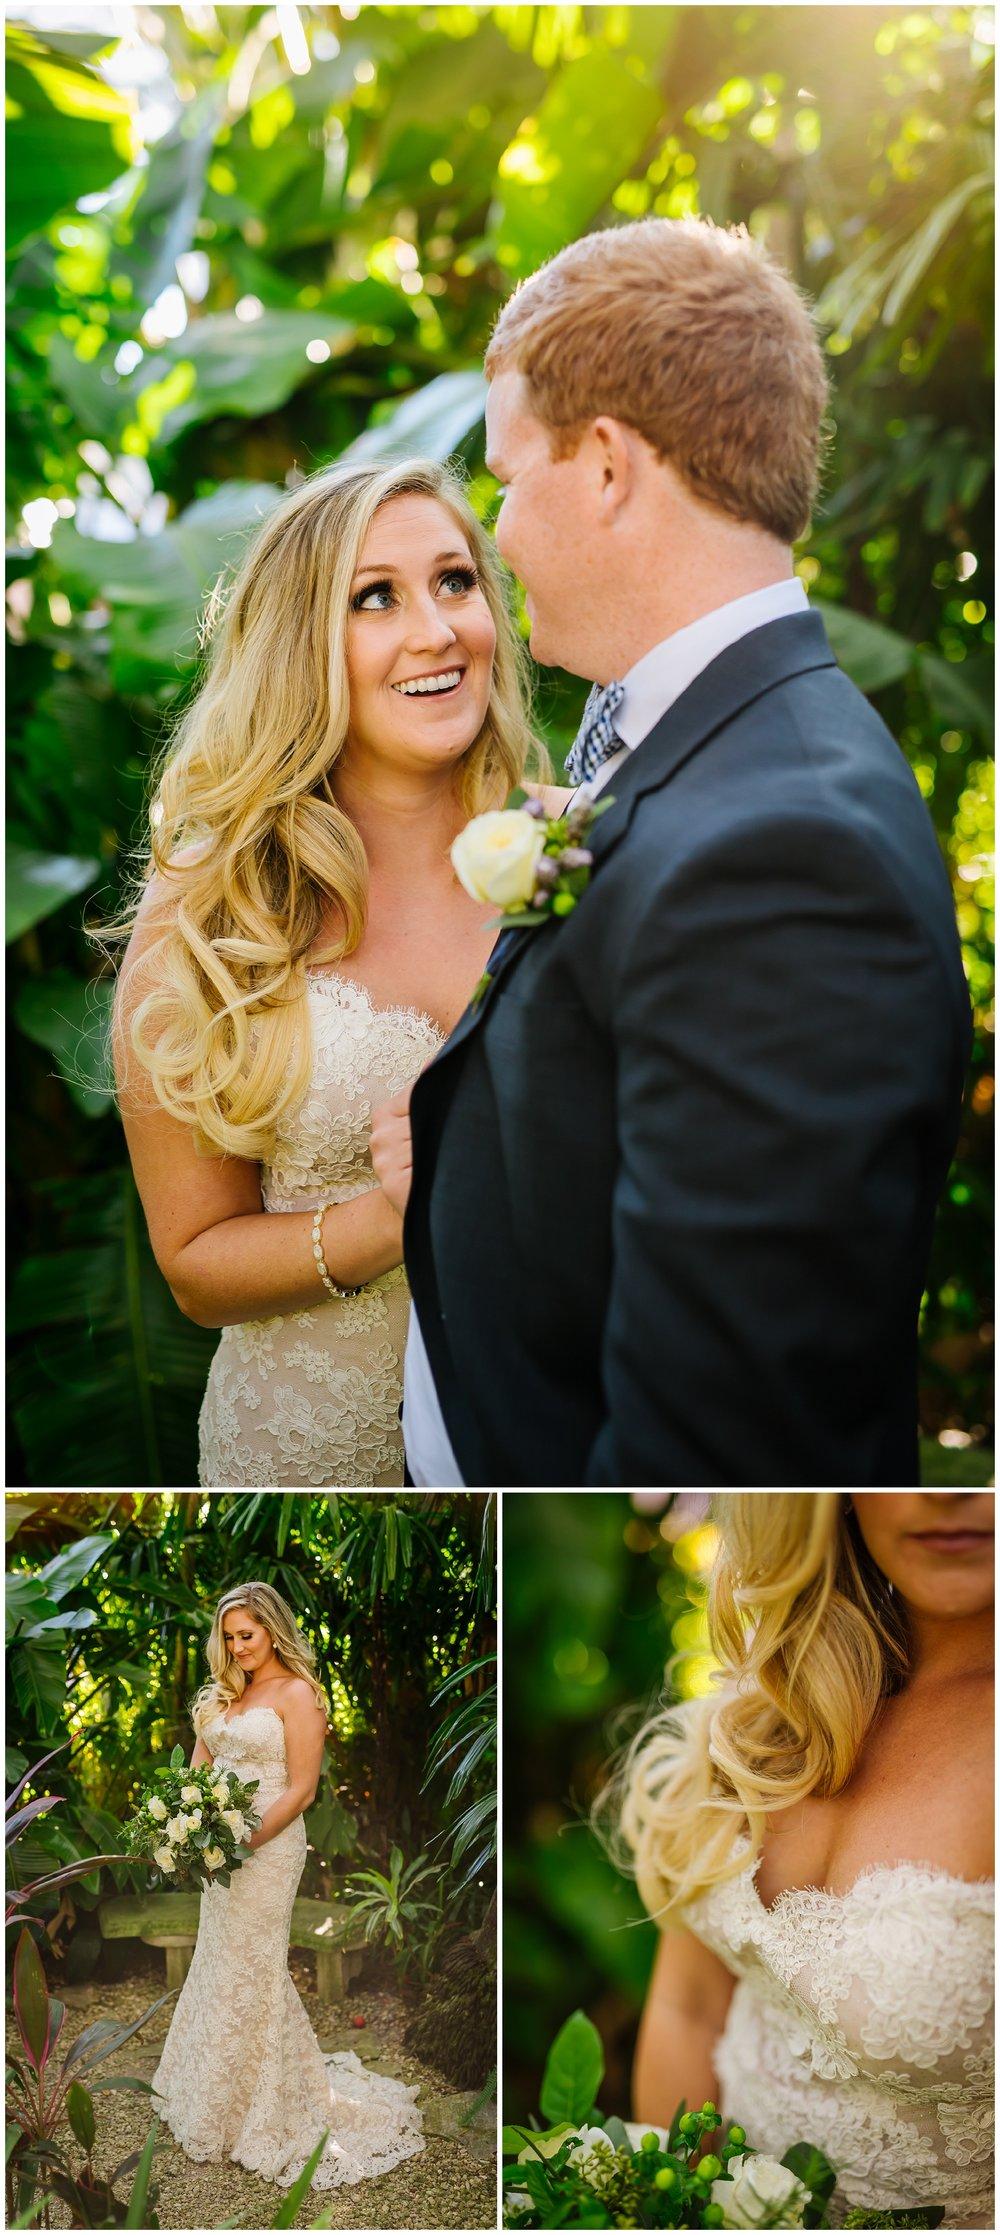 Ashlee-hamon-photography-year-in-review-2016-travel-wanderlust-vsco-adventure-wedding_0074.jpg